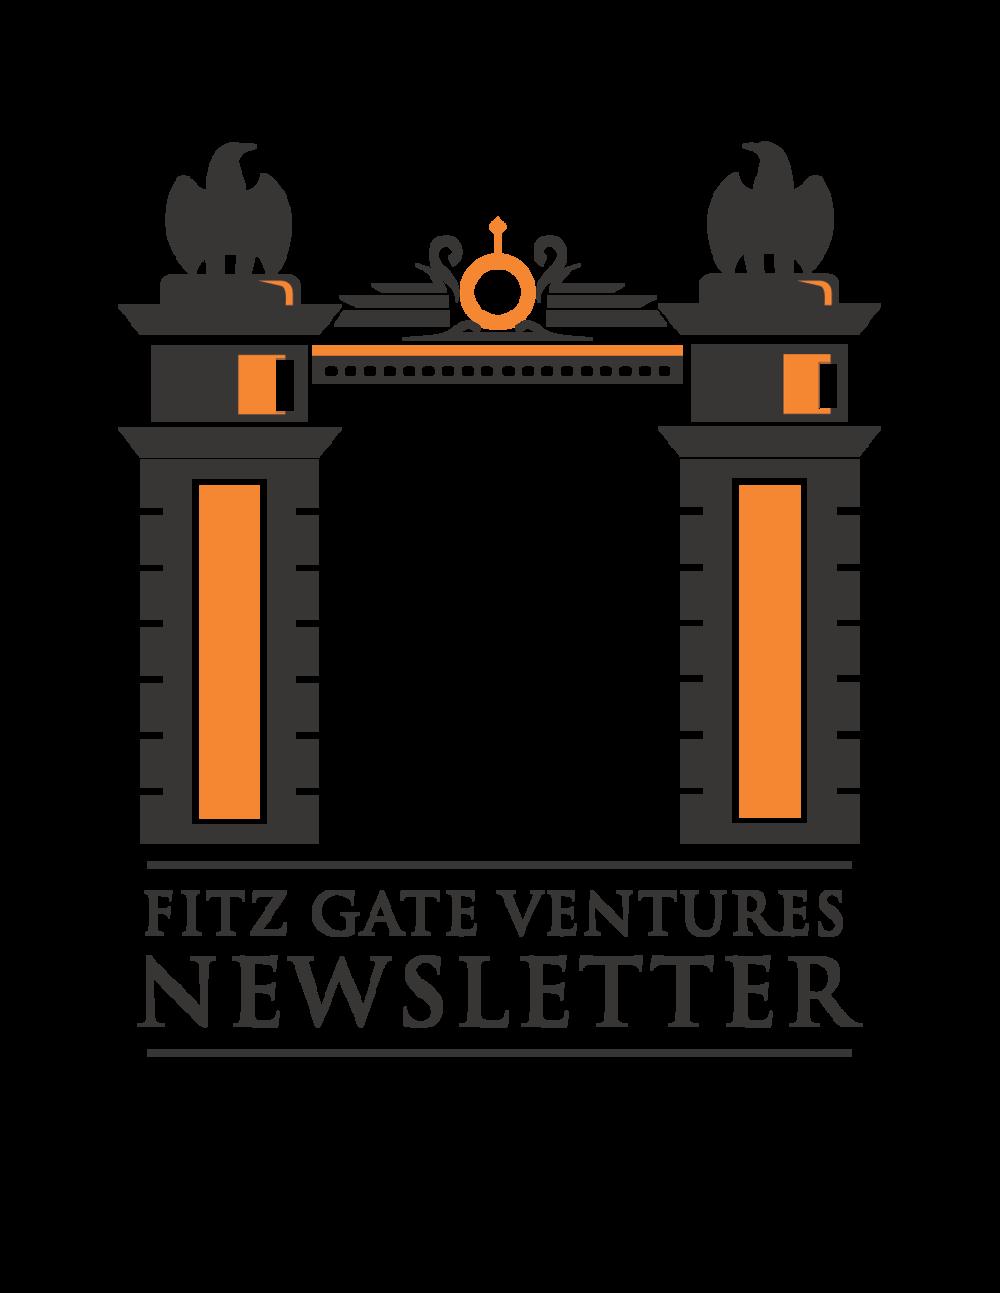 FitzGateVenturesNewsletterLogo.png